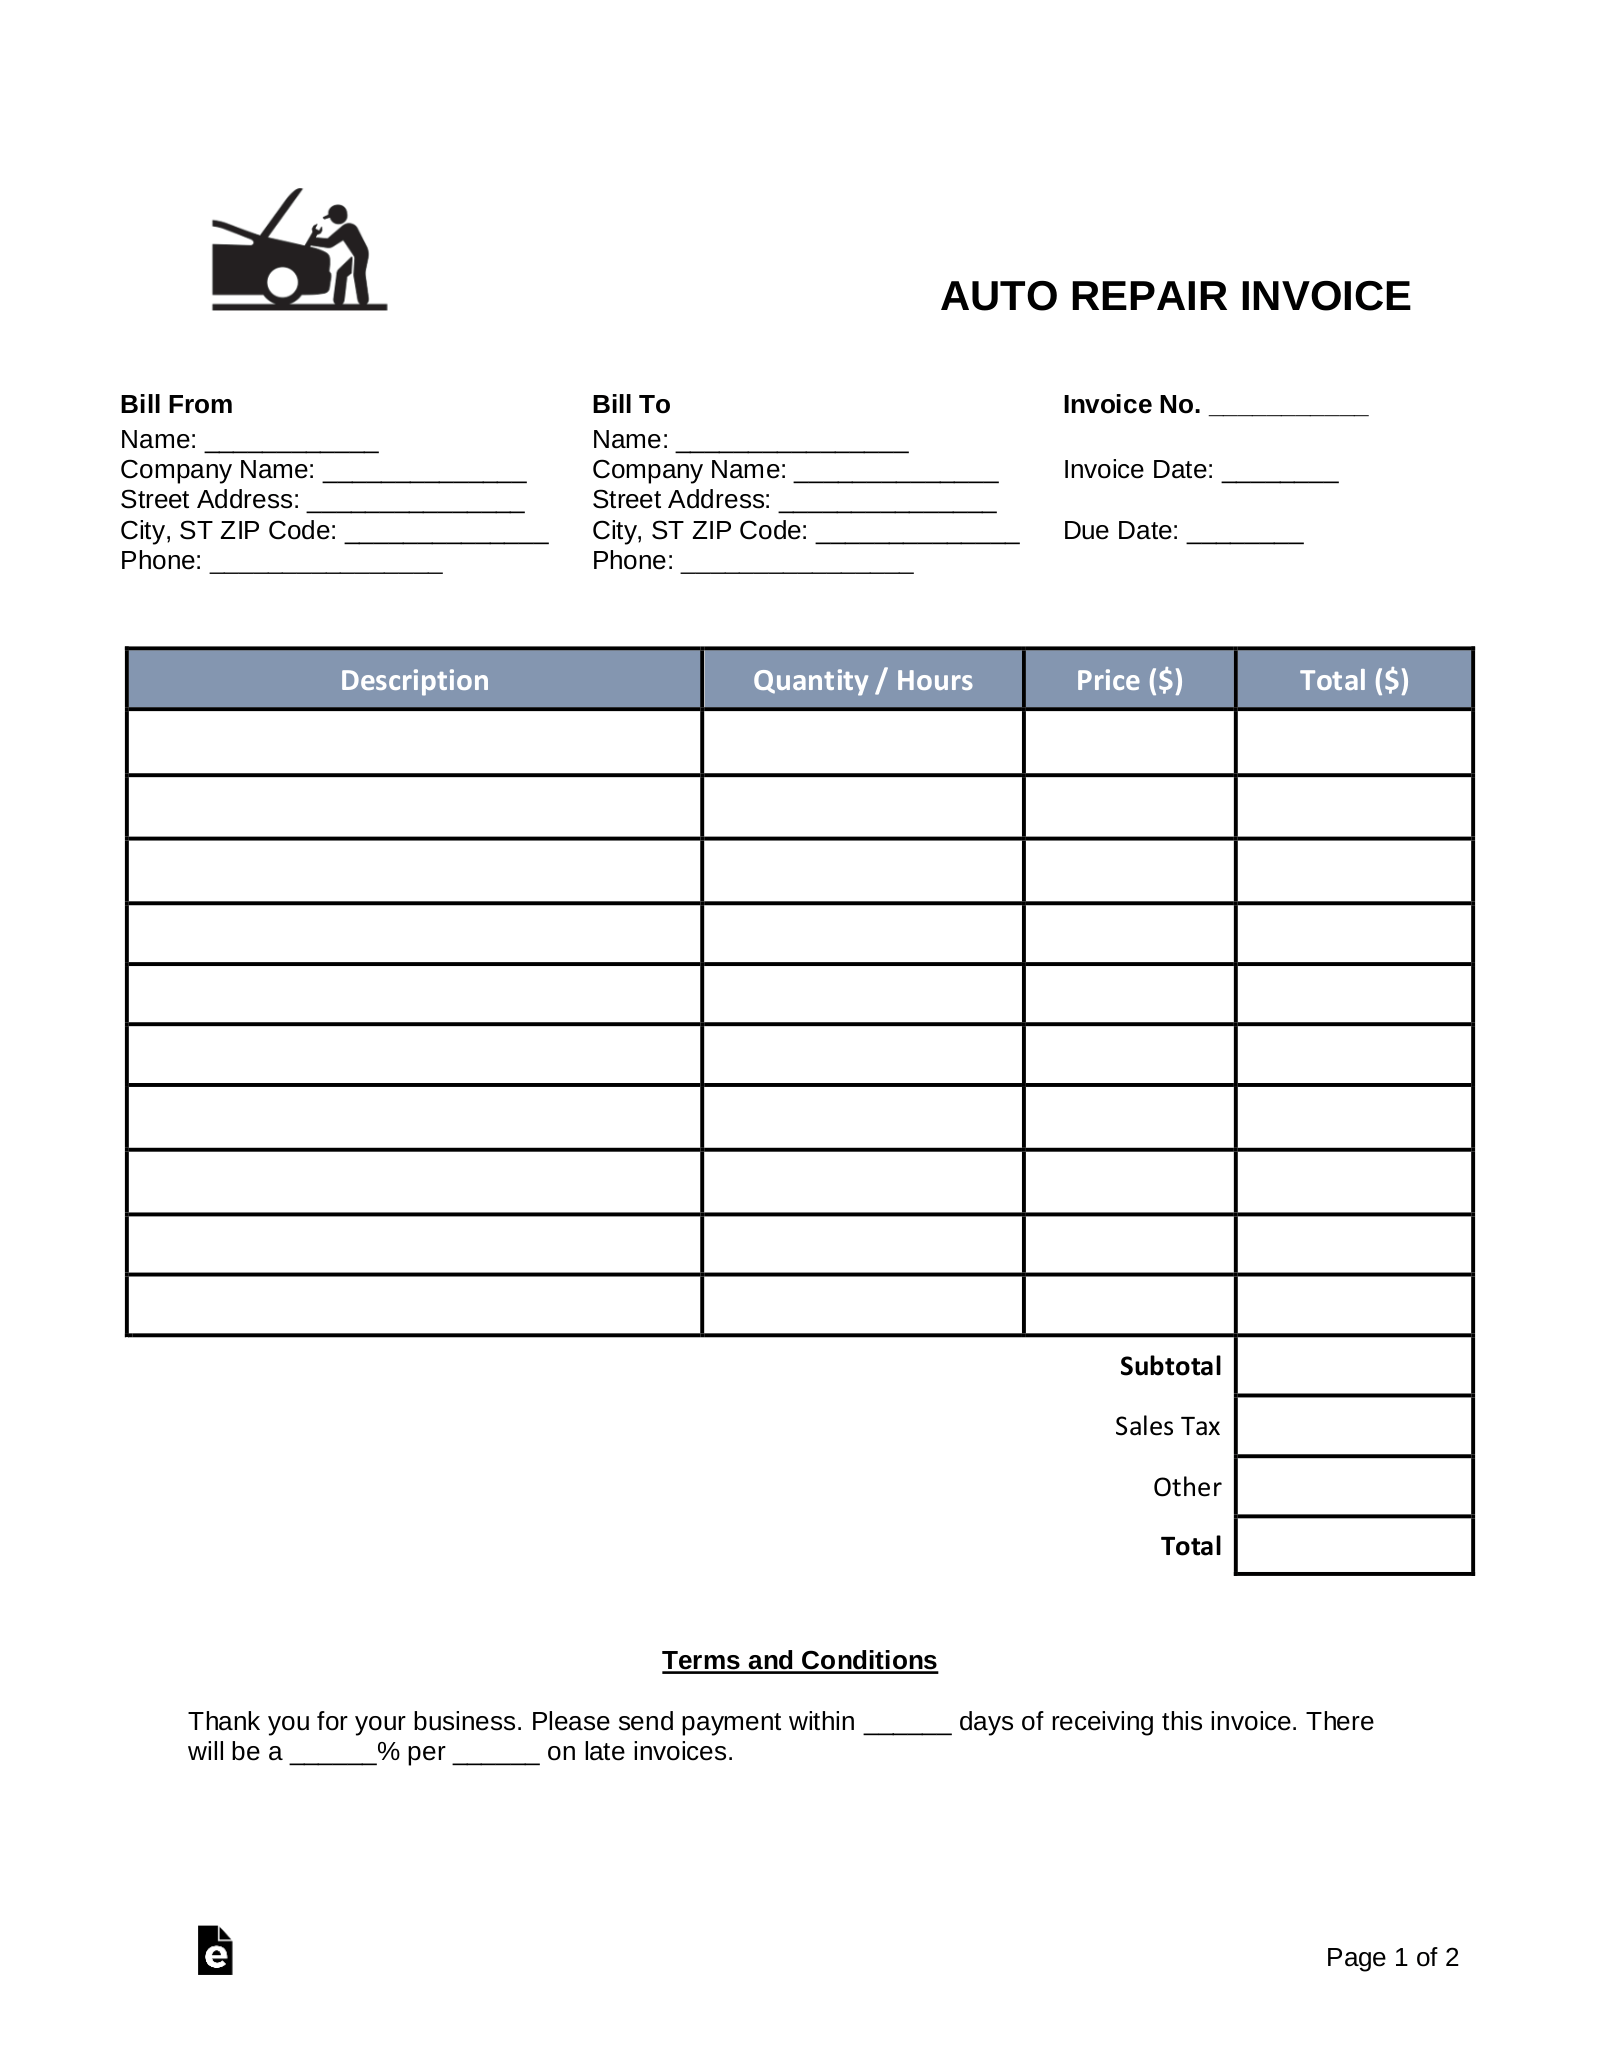 Free Auto Body Mechanic Invoice Template